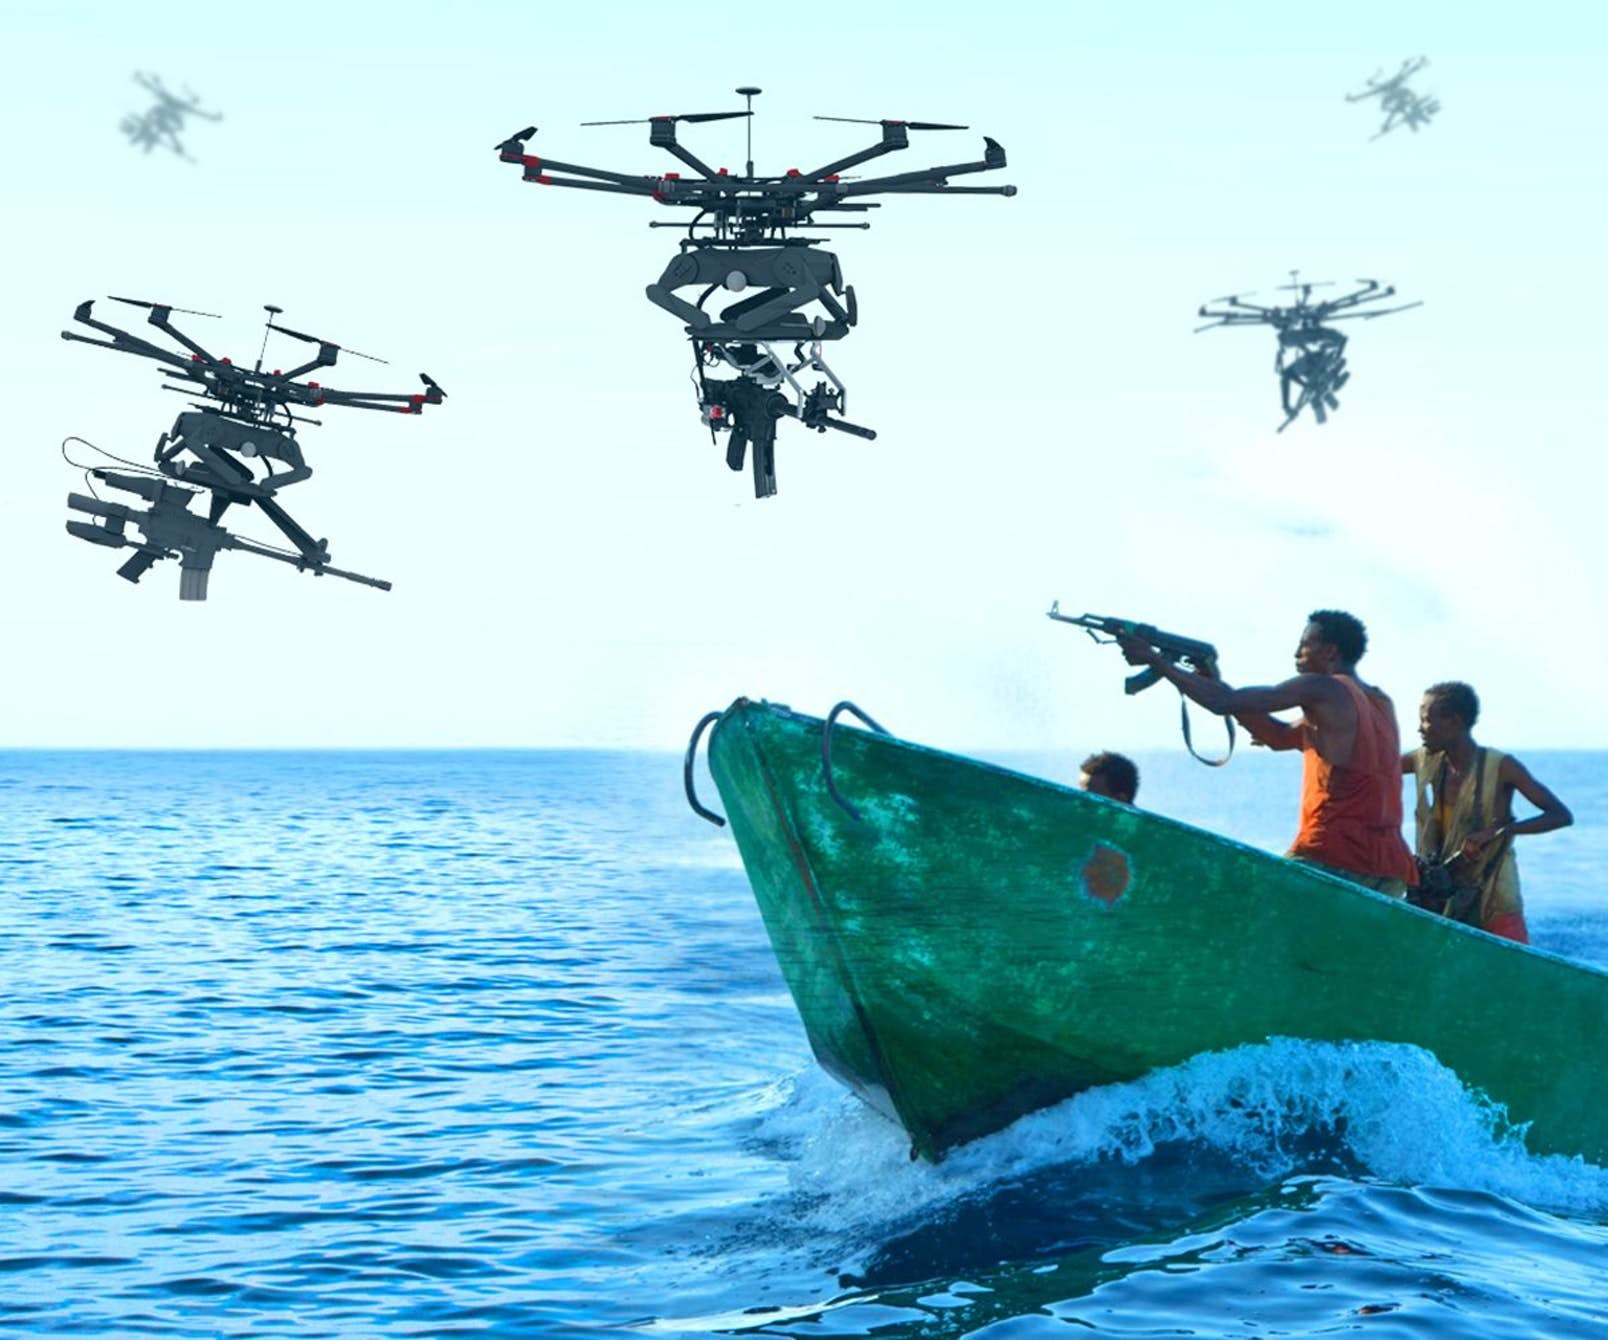 Drony proti pirátům. Kredit: Duke Robotics.